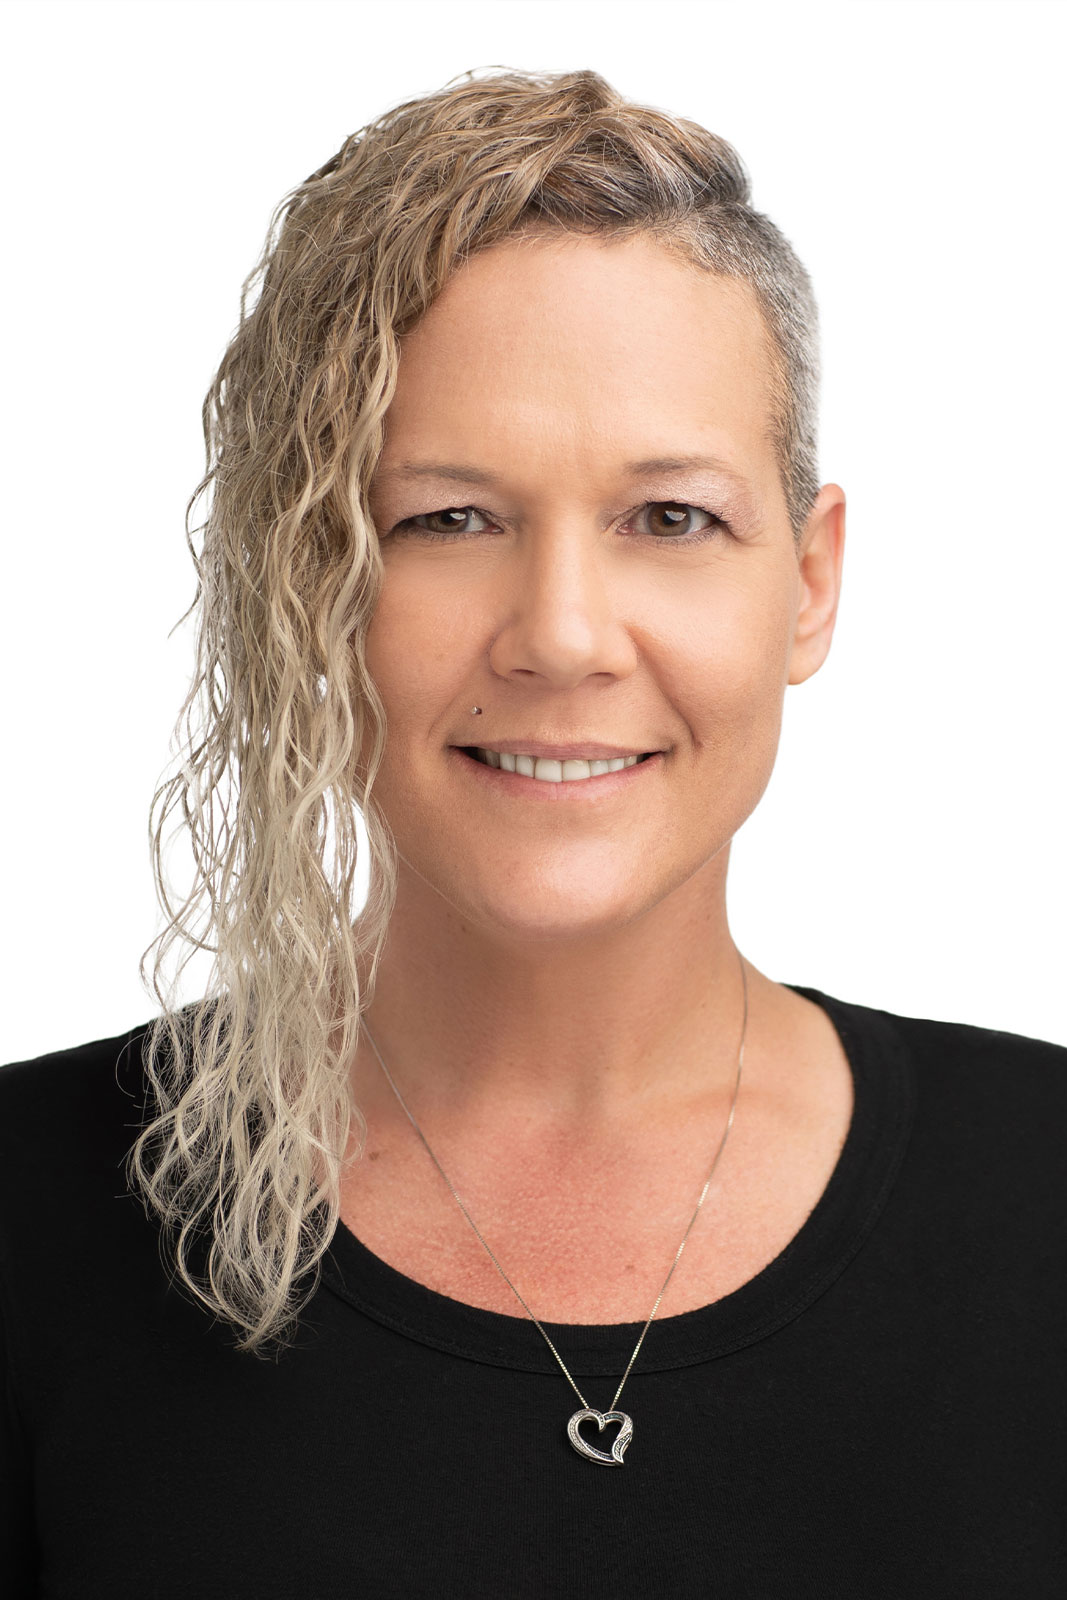 Melinda Morisset